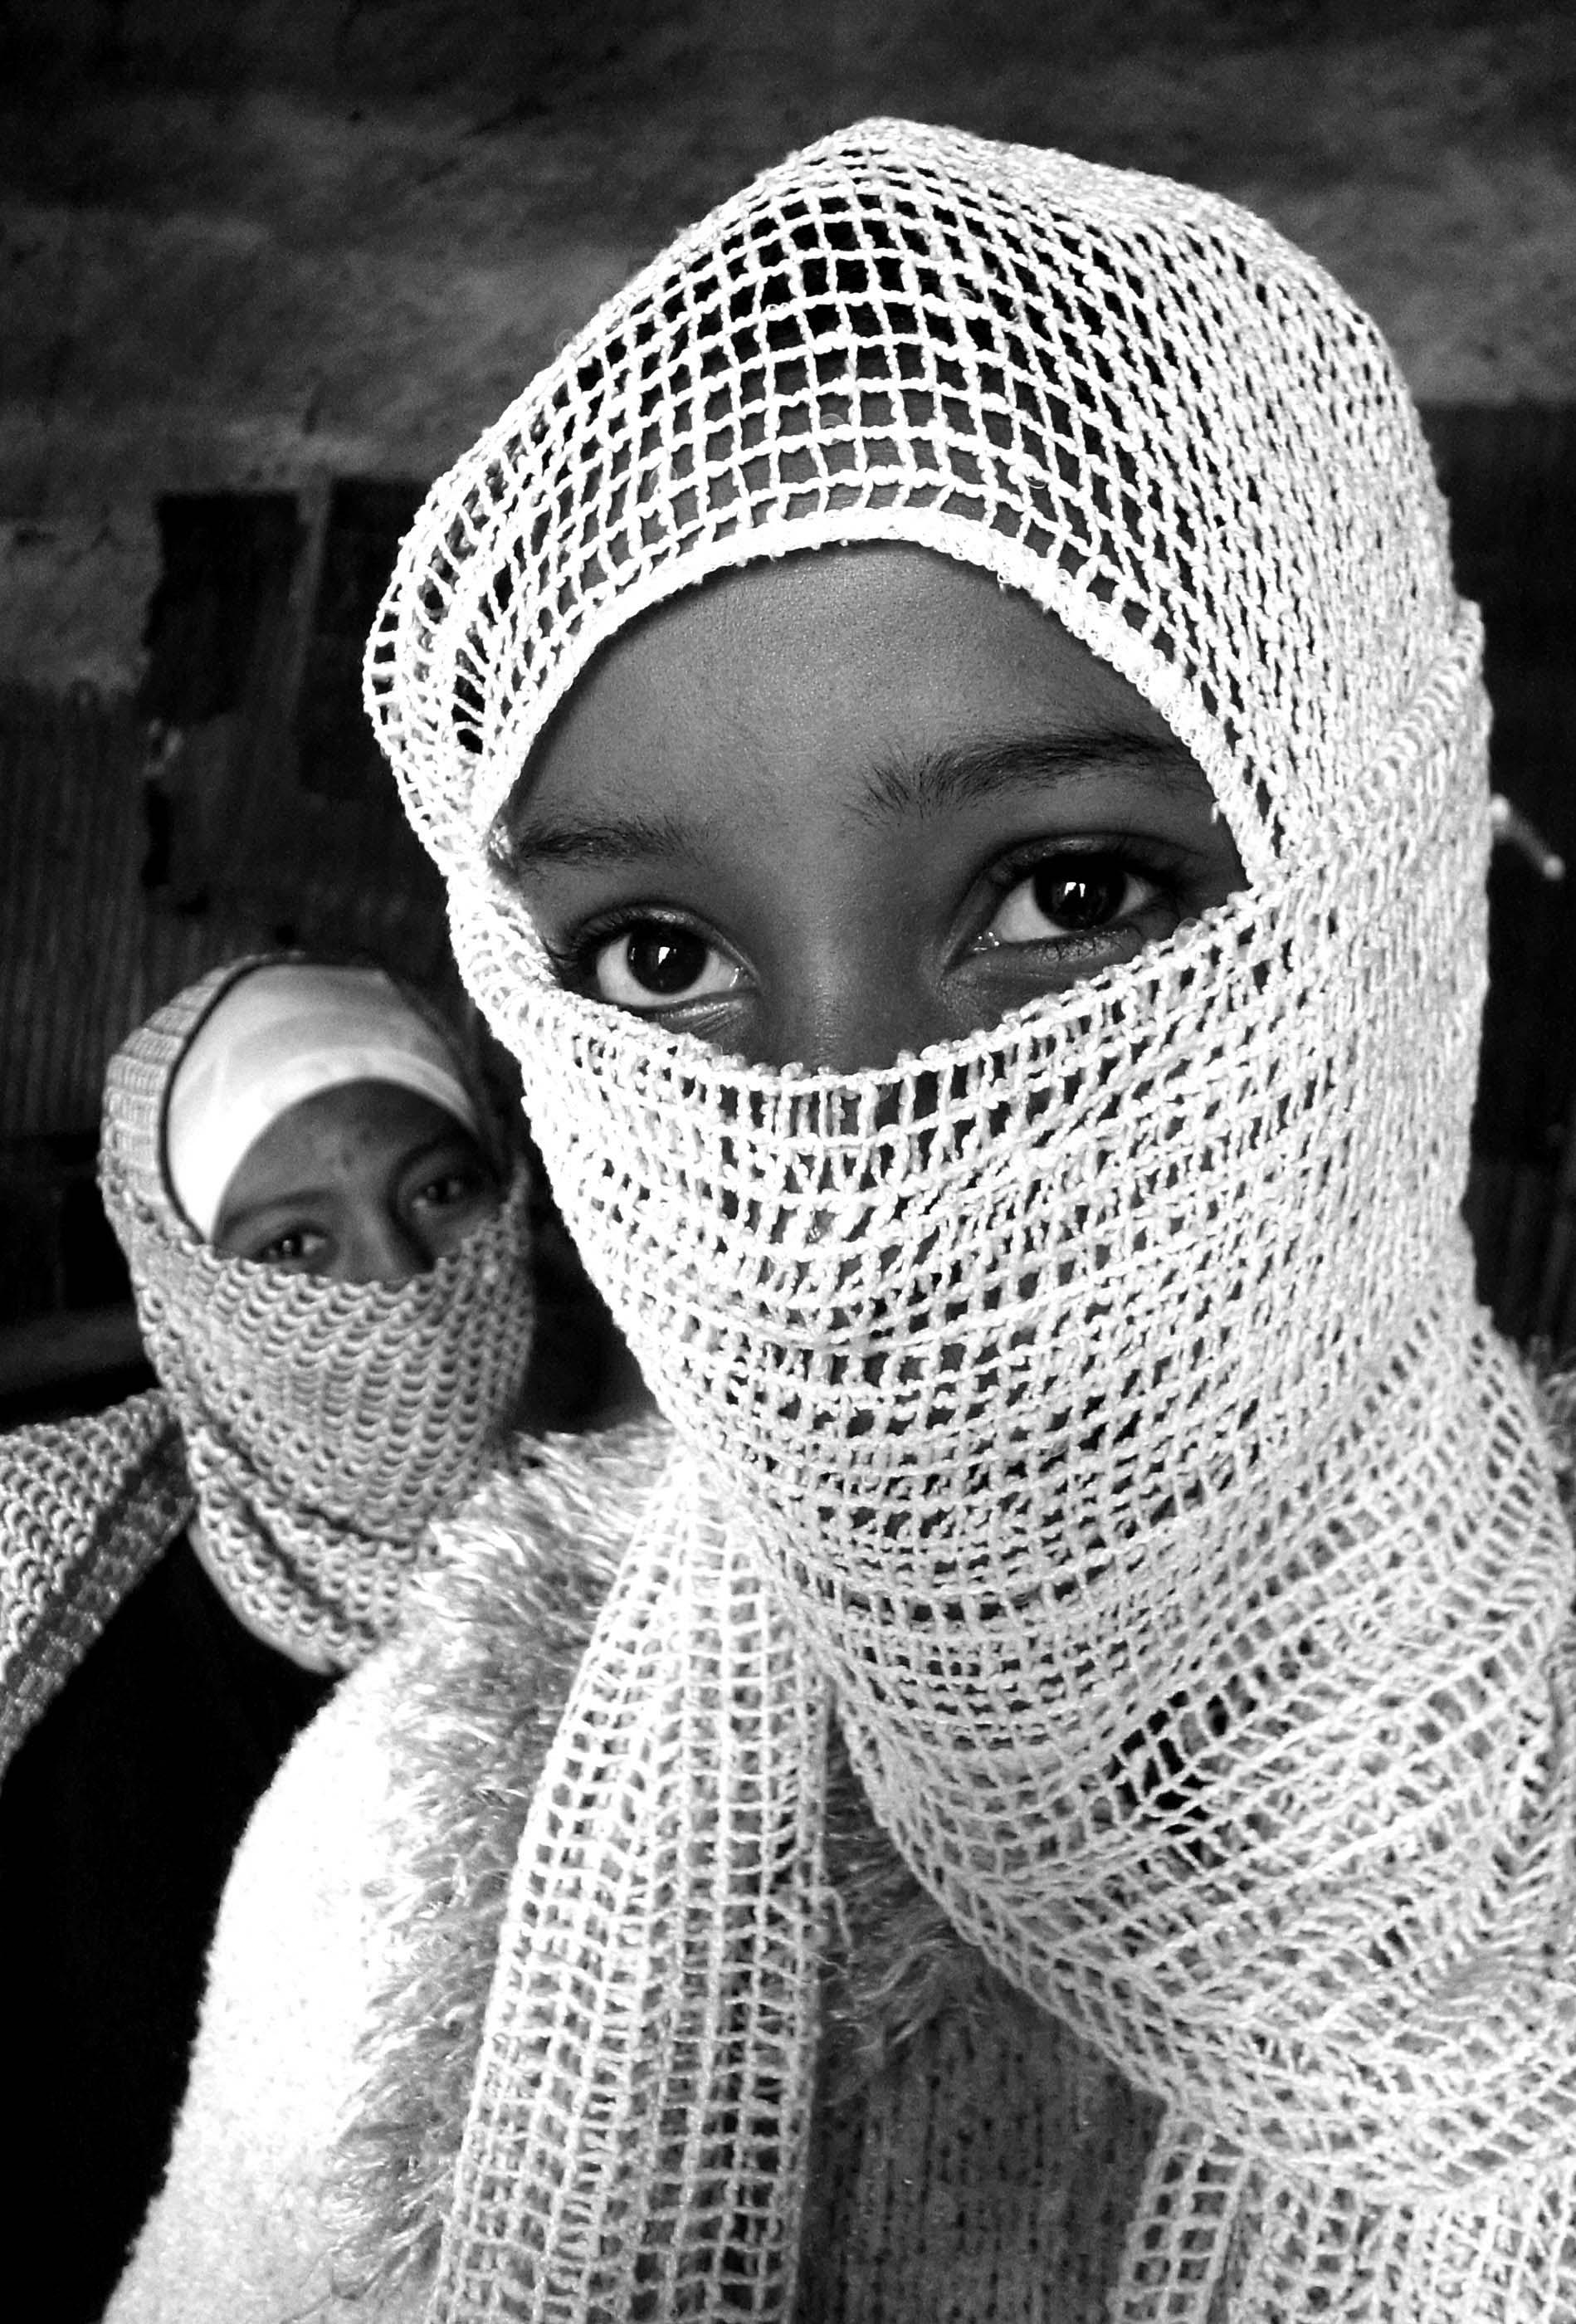 """Shy girls in Quran school"" Islam in Ethiopia series - Dese, Welo, Ethiopia"